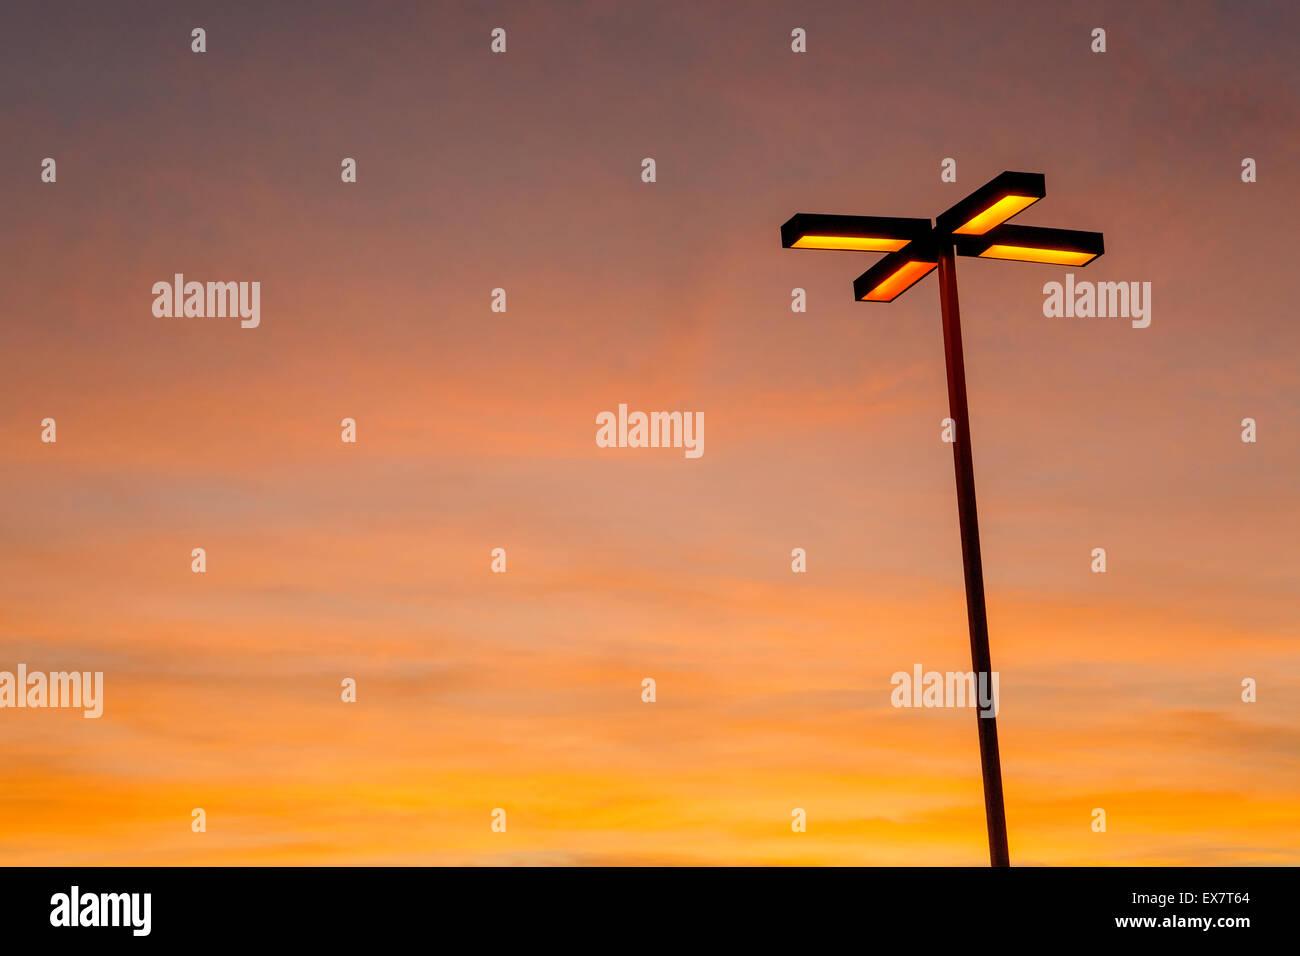 Light pole glowing at dusk, San Diego, California - Stock Image